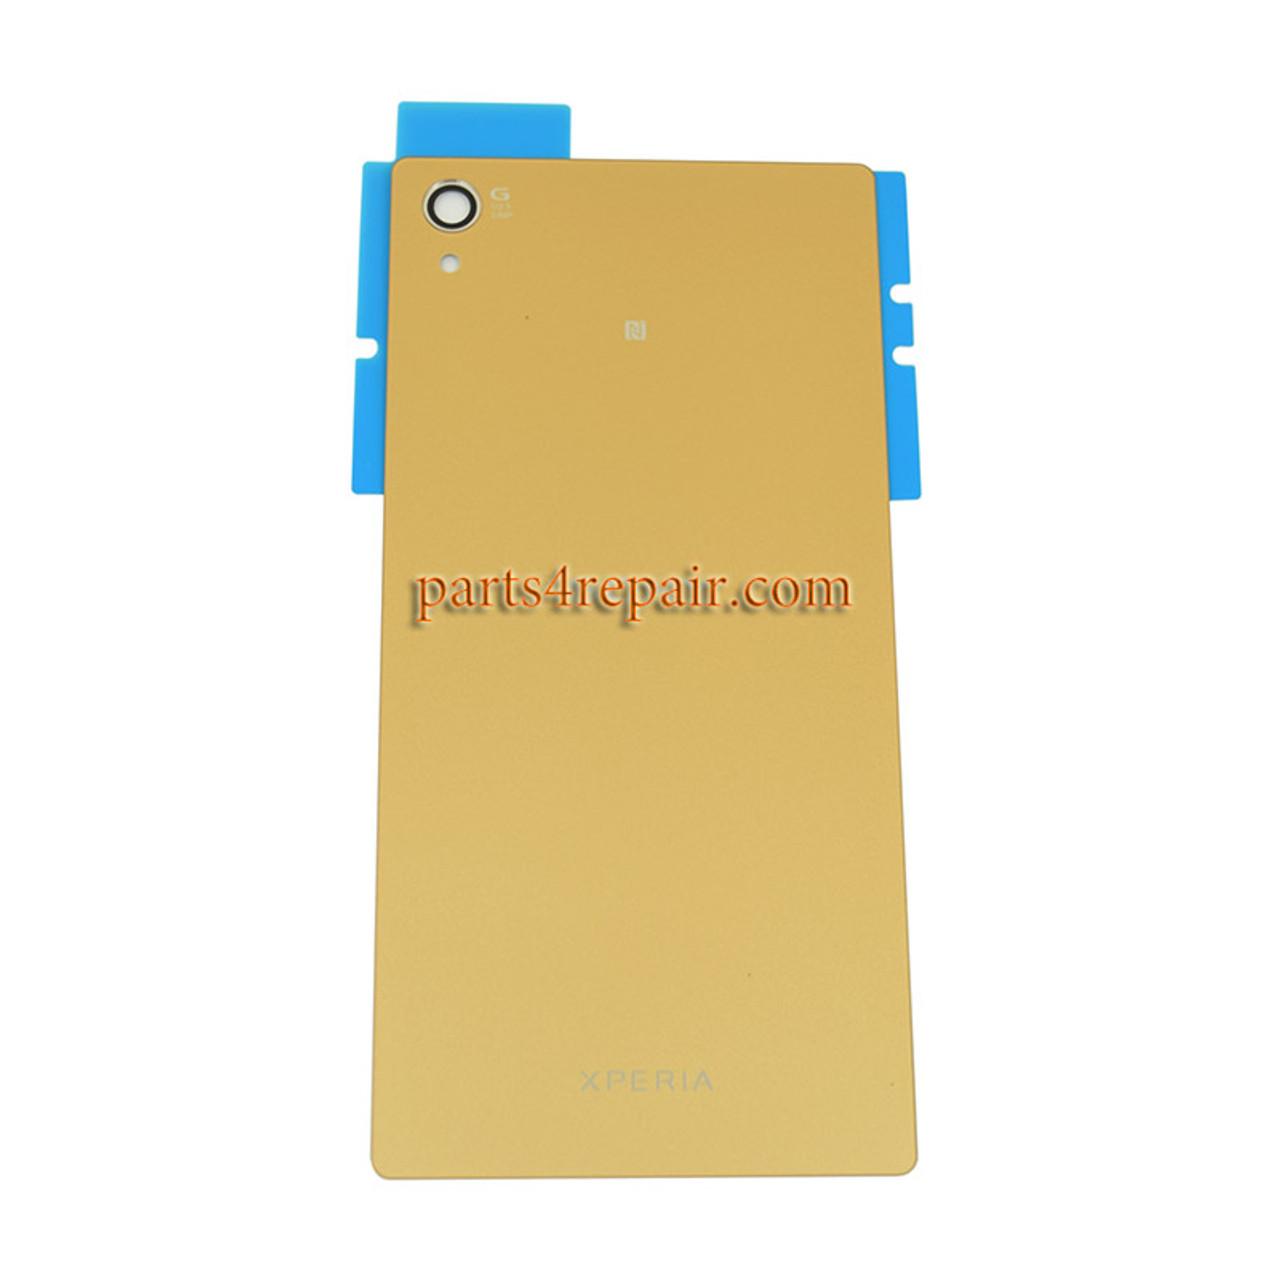 sony xperia z5 premium gold. back cover oem for sony xperia z5 premium -gold gold x